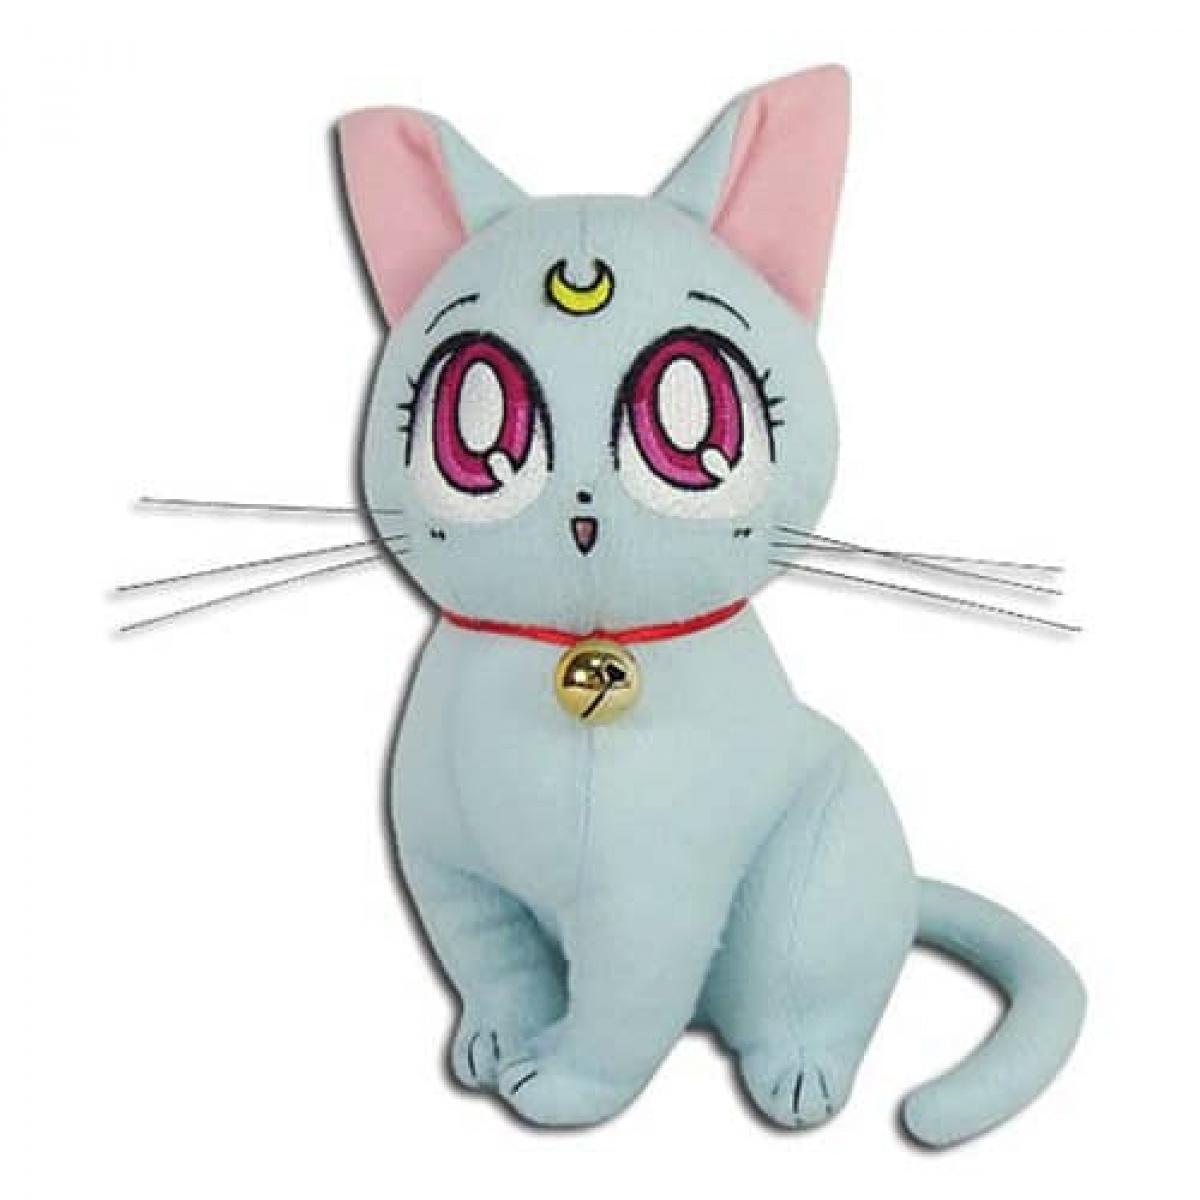 Sailor Moon SuperS Diana 8″ Plush Anime Plushies 4